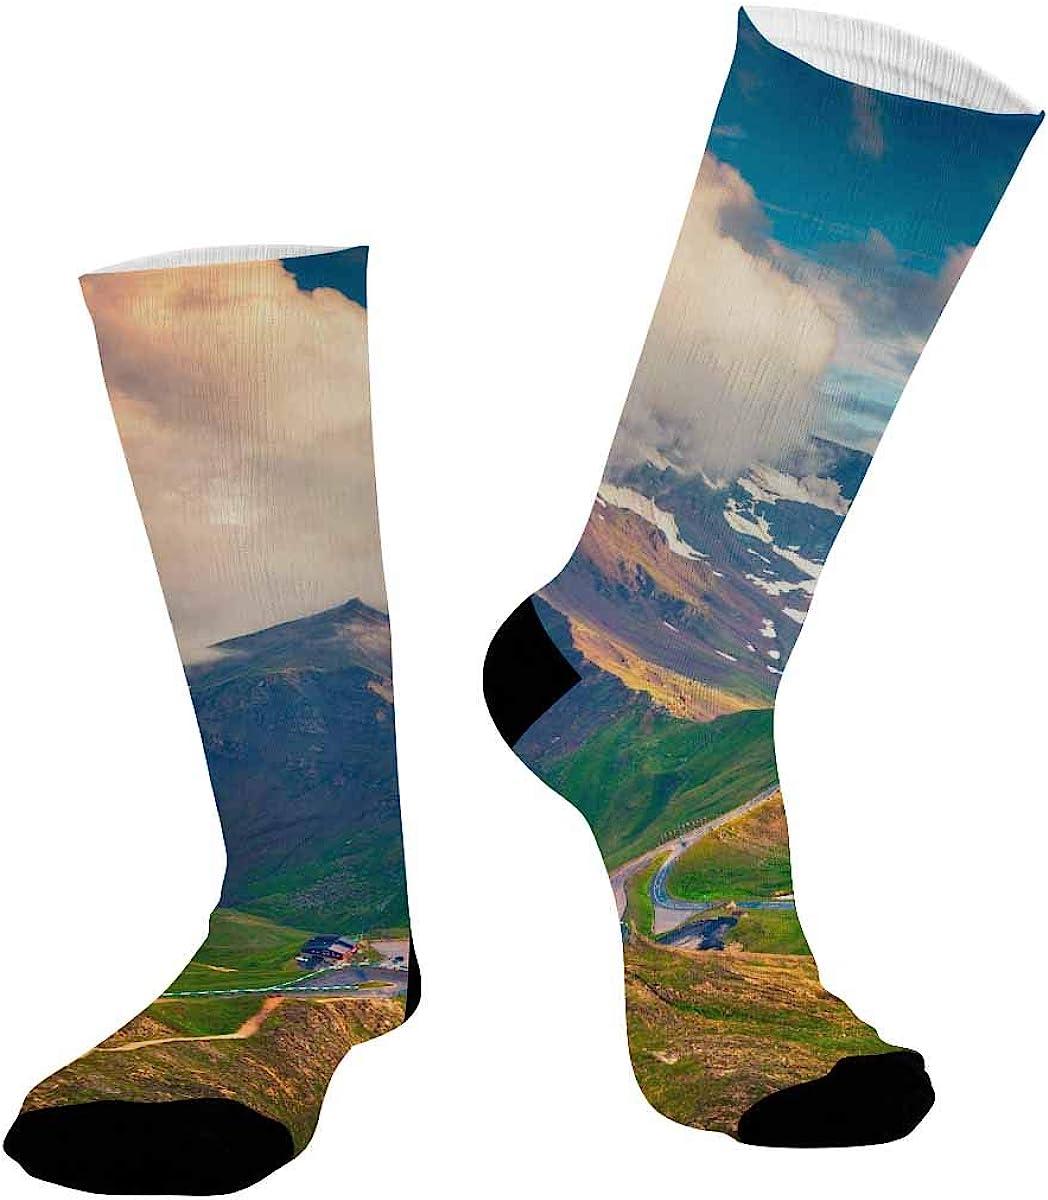 INTERESTPRINT Athletic Socks, Unisex Sublimated Crew Socks Grossglockner High Alpine Road